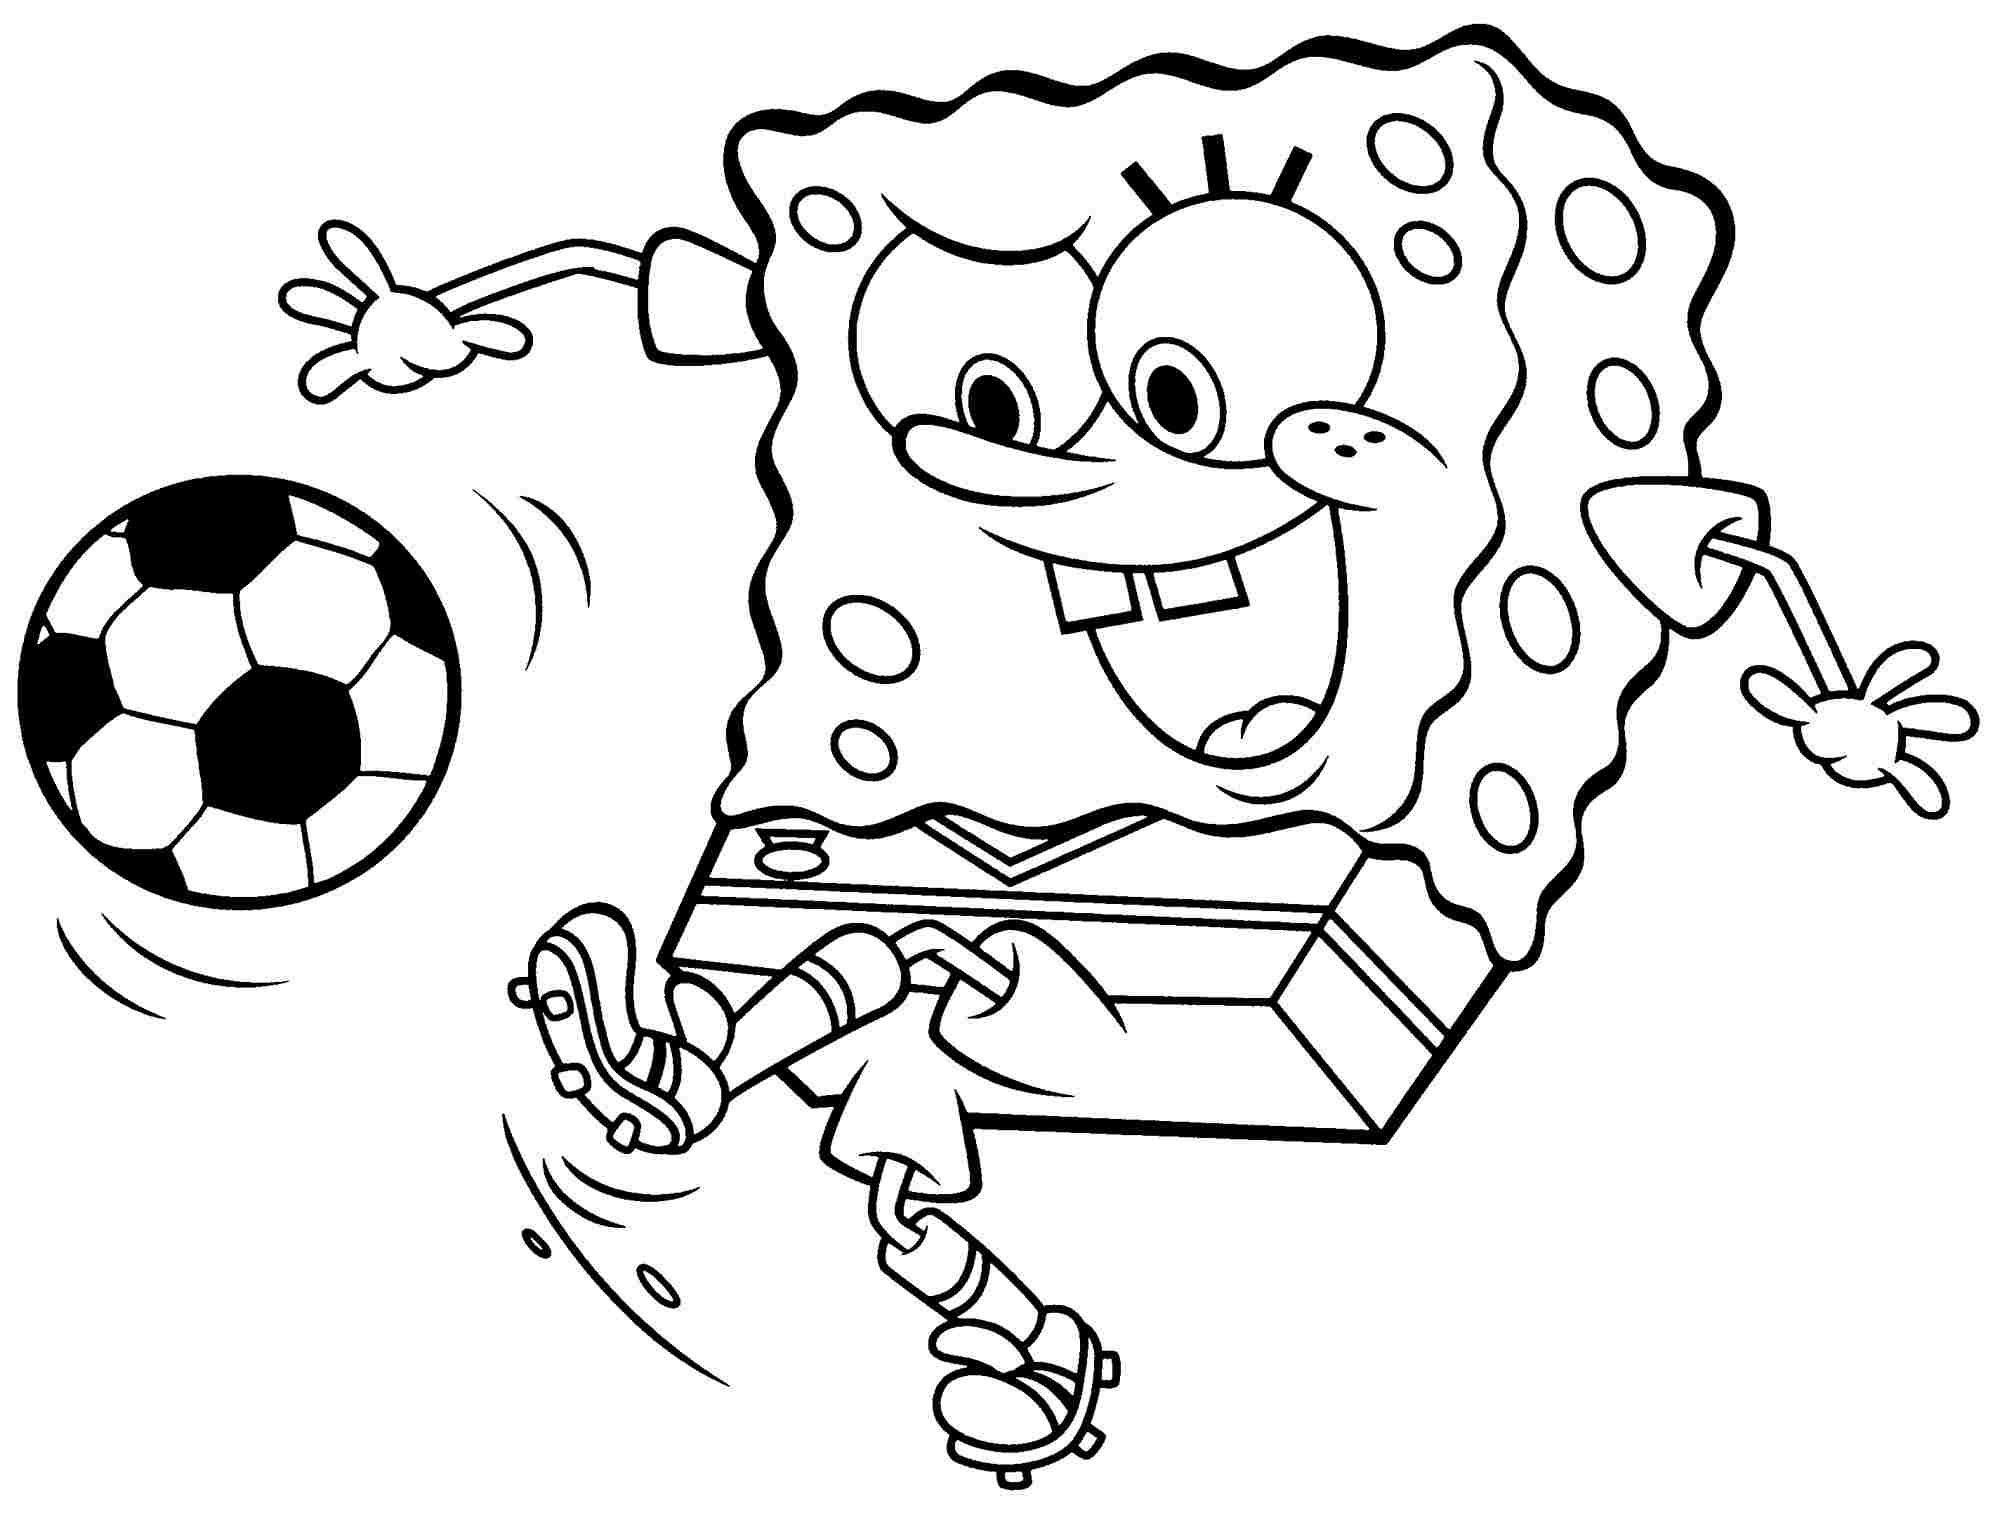 Coloring Book Pages Spongebob Images